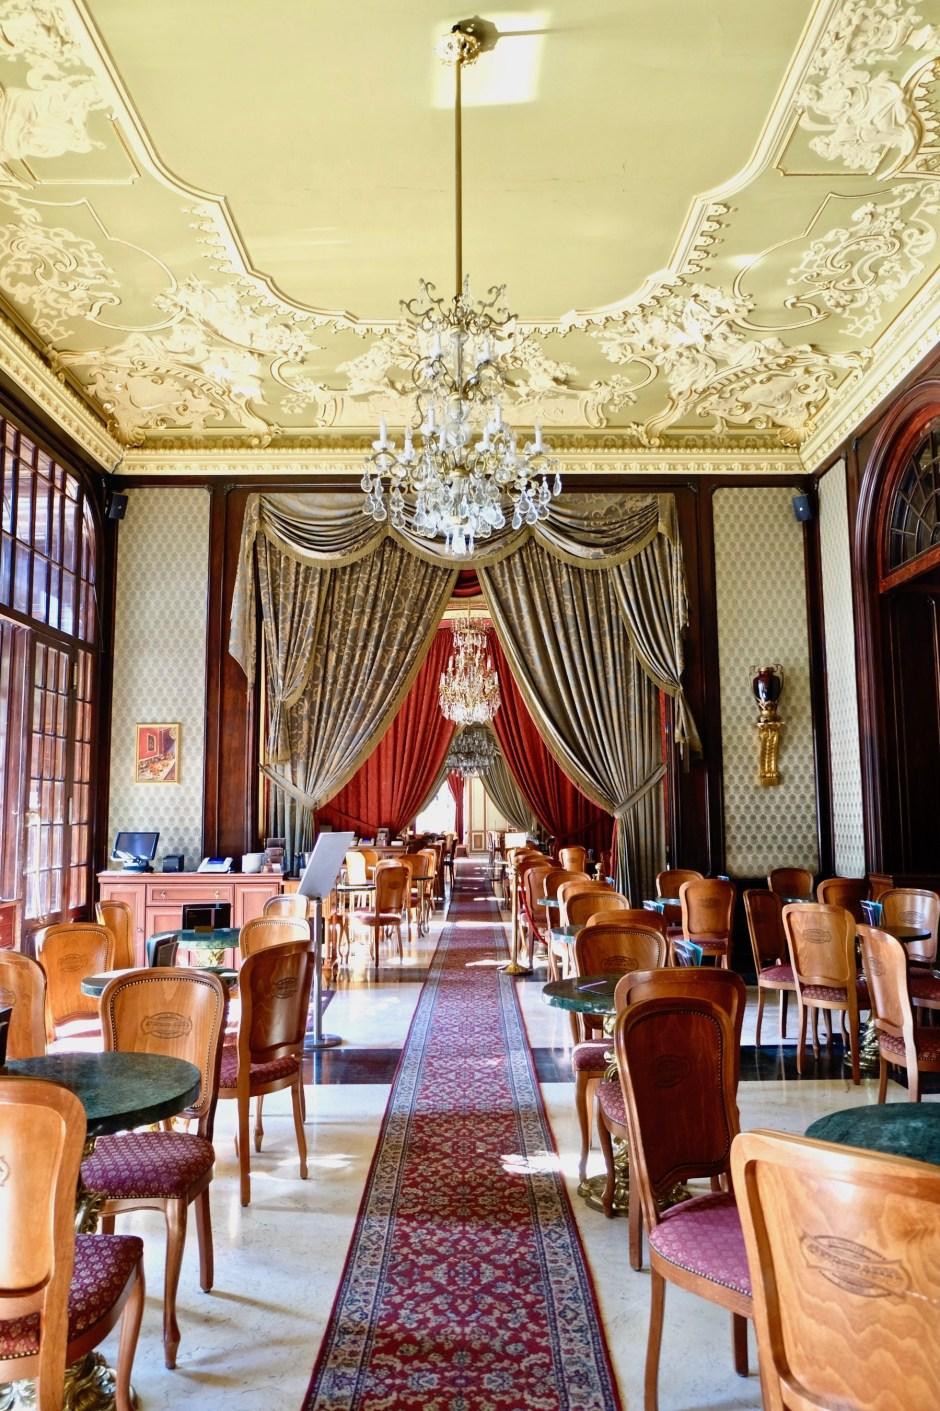 Cafe Gerbeaud interior design